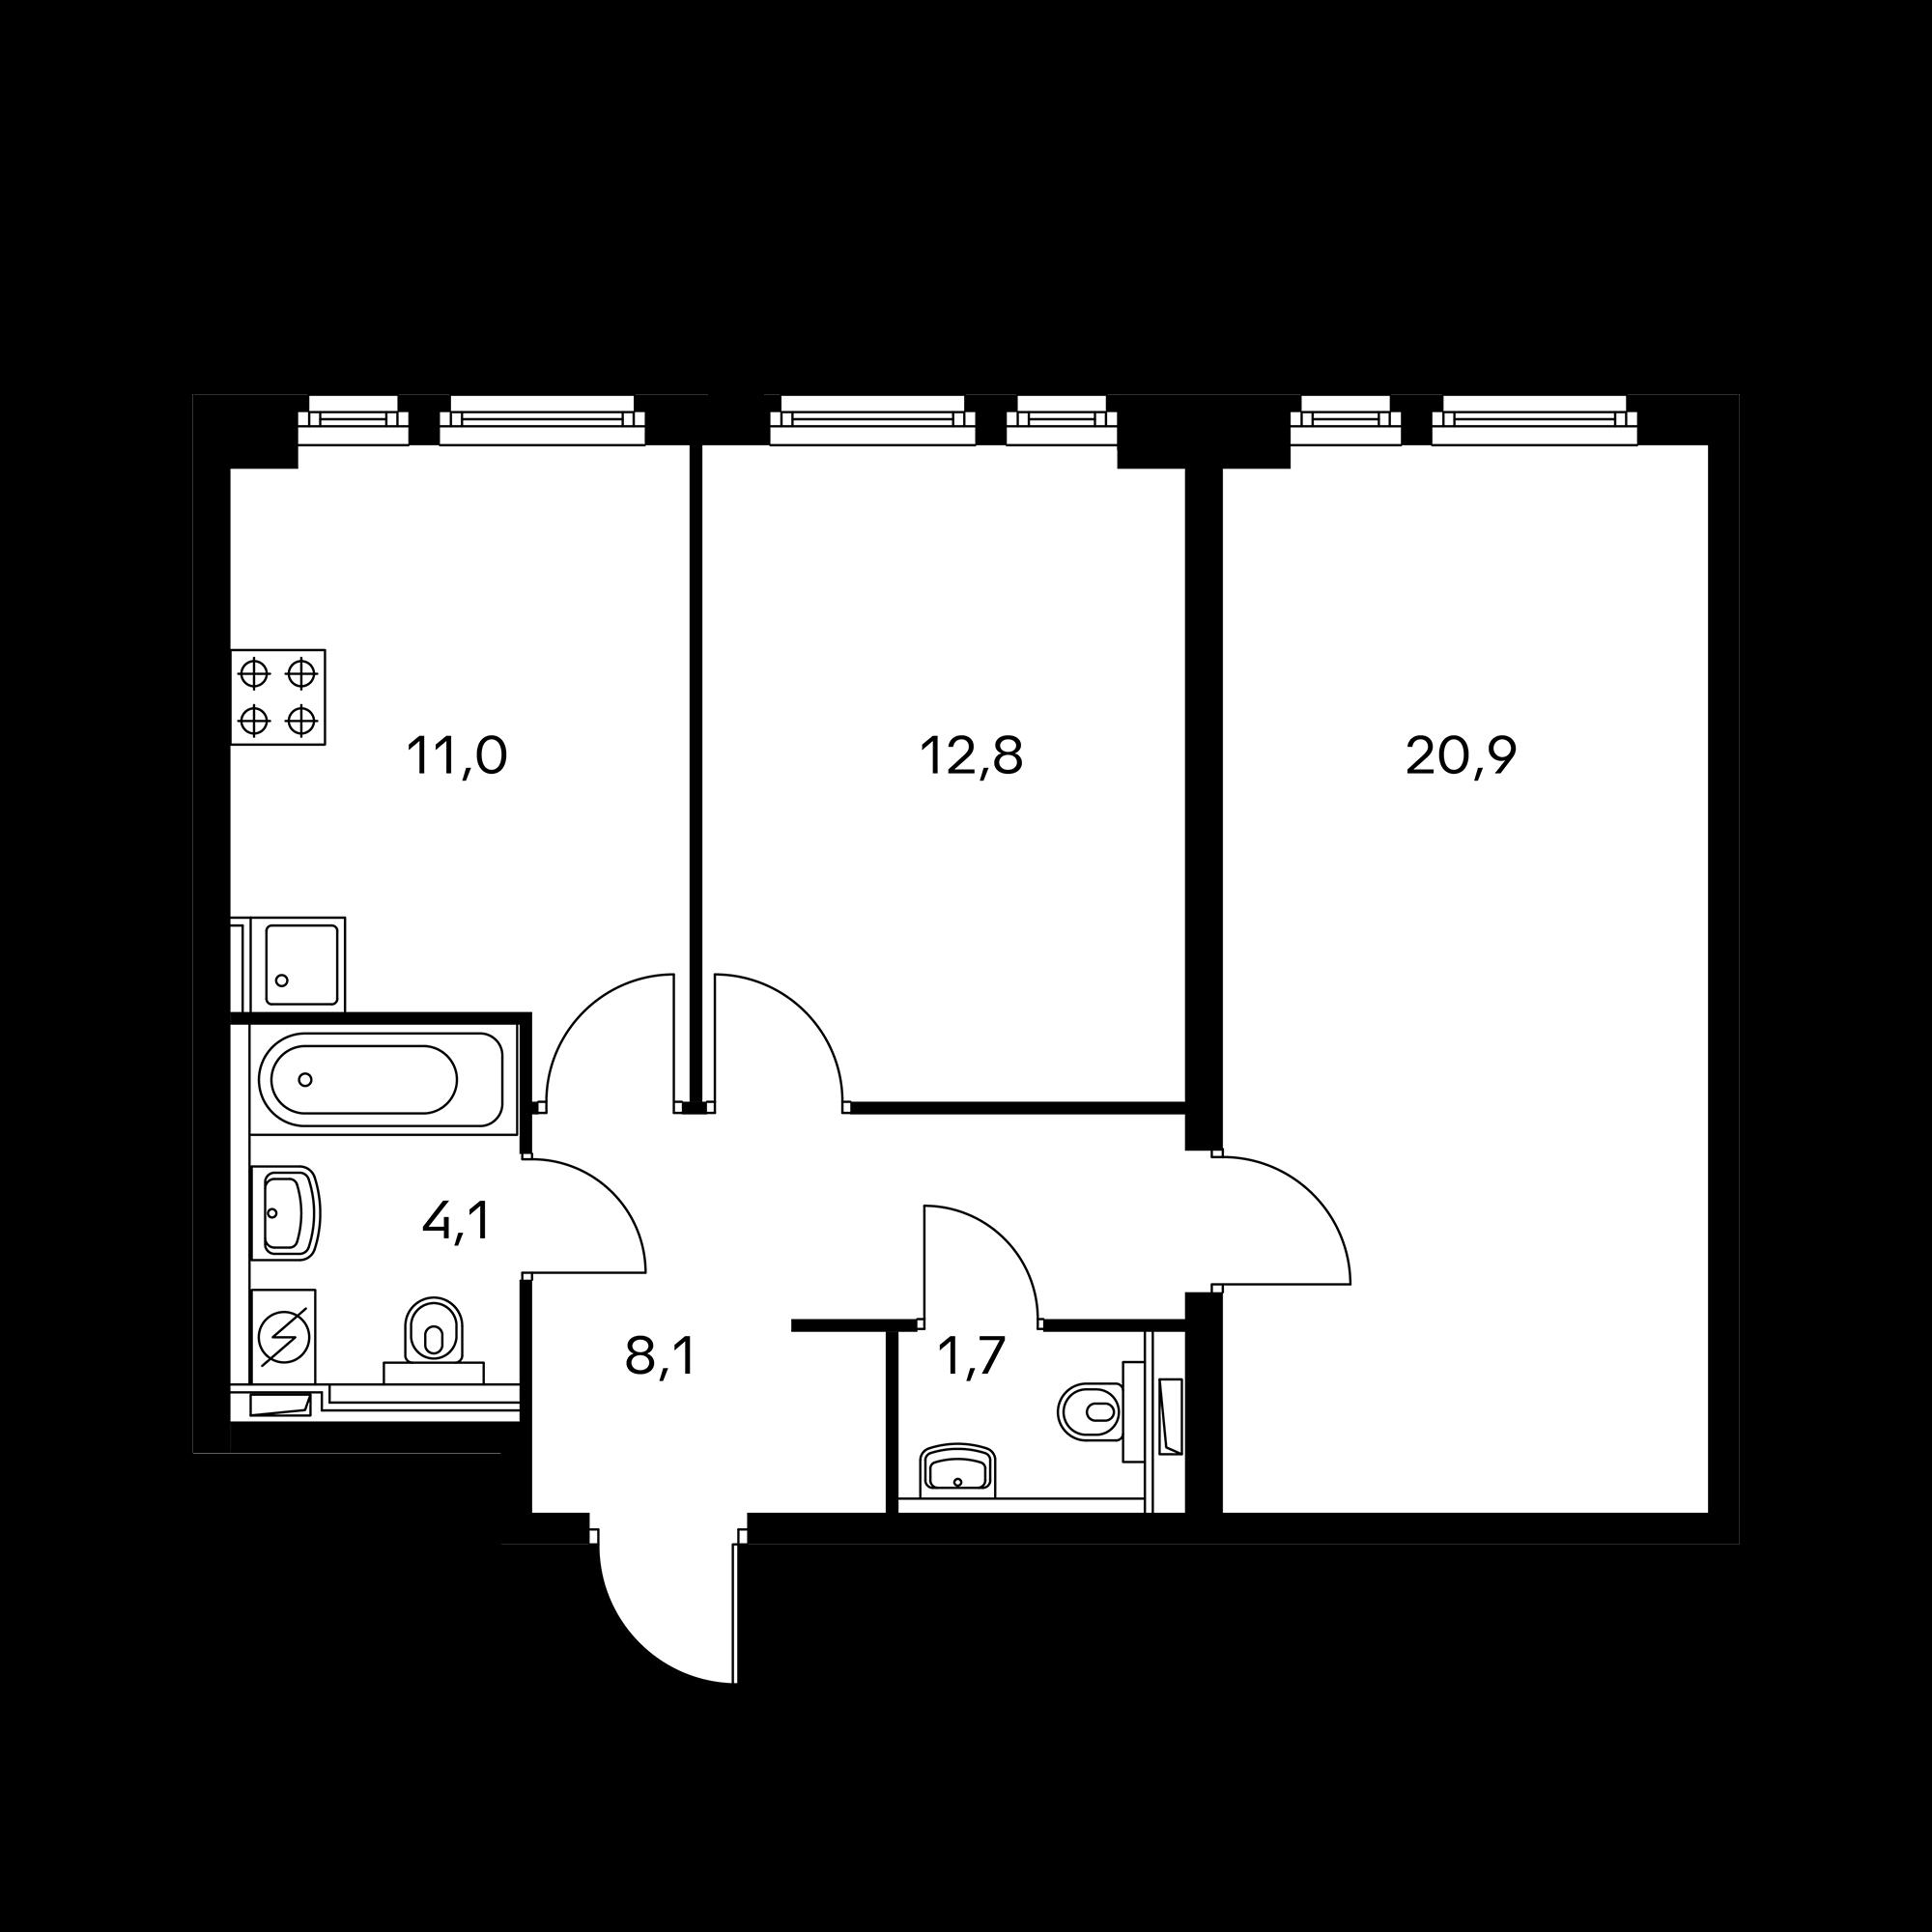 2KM6-9.6-2_S_Z